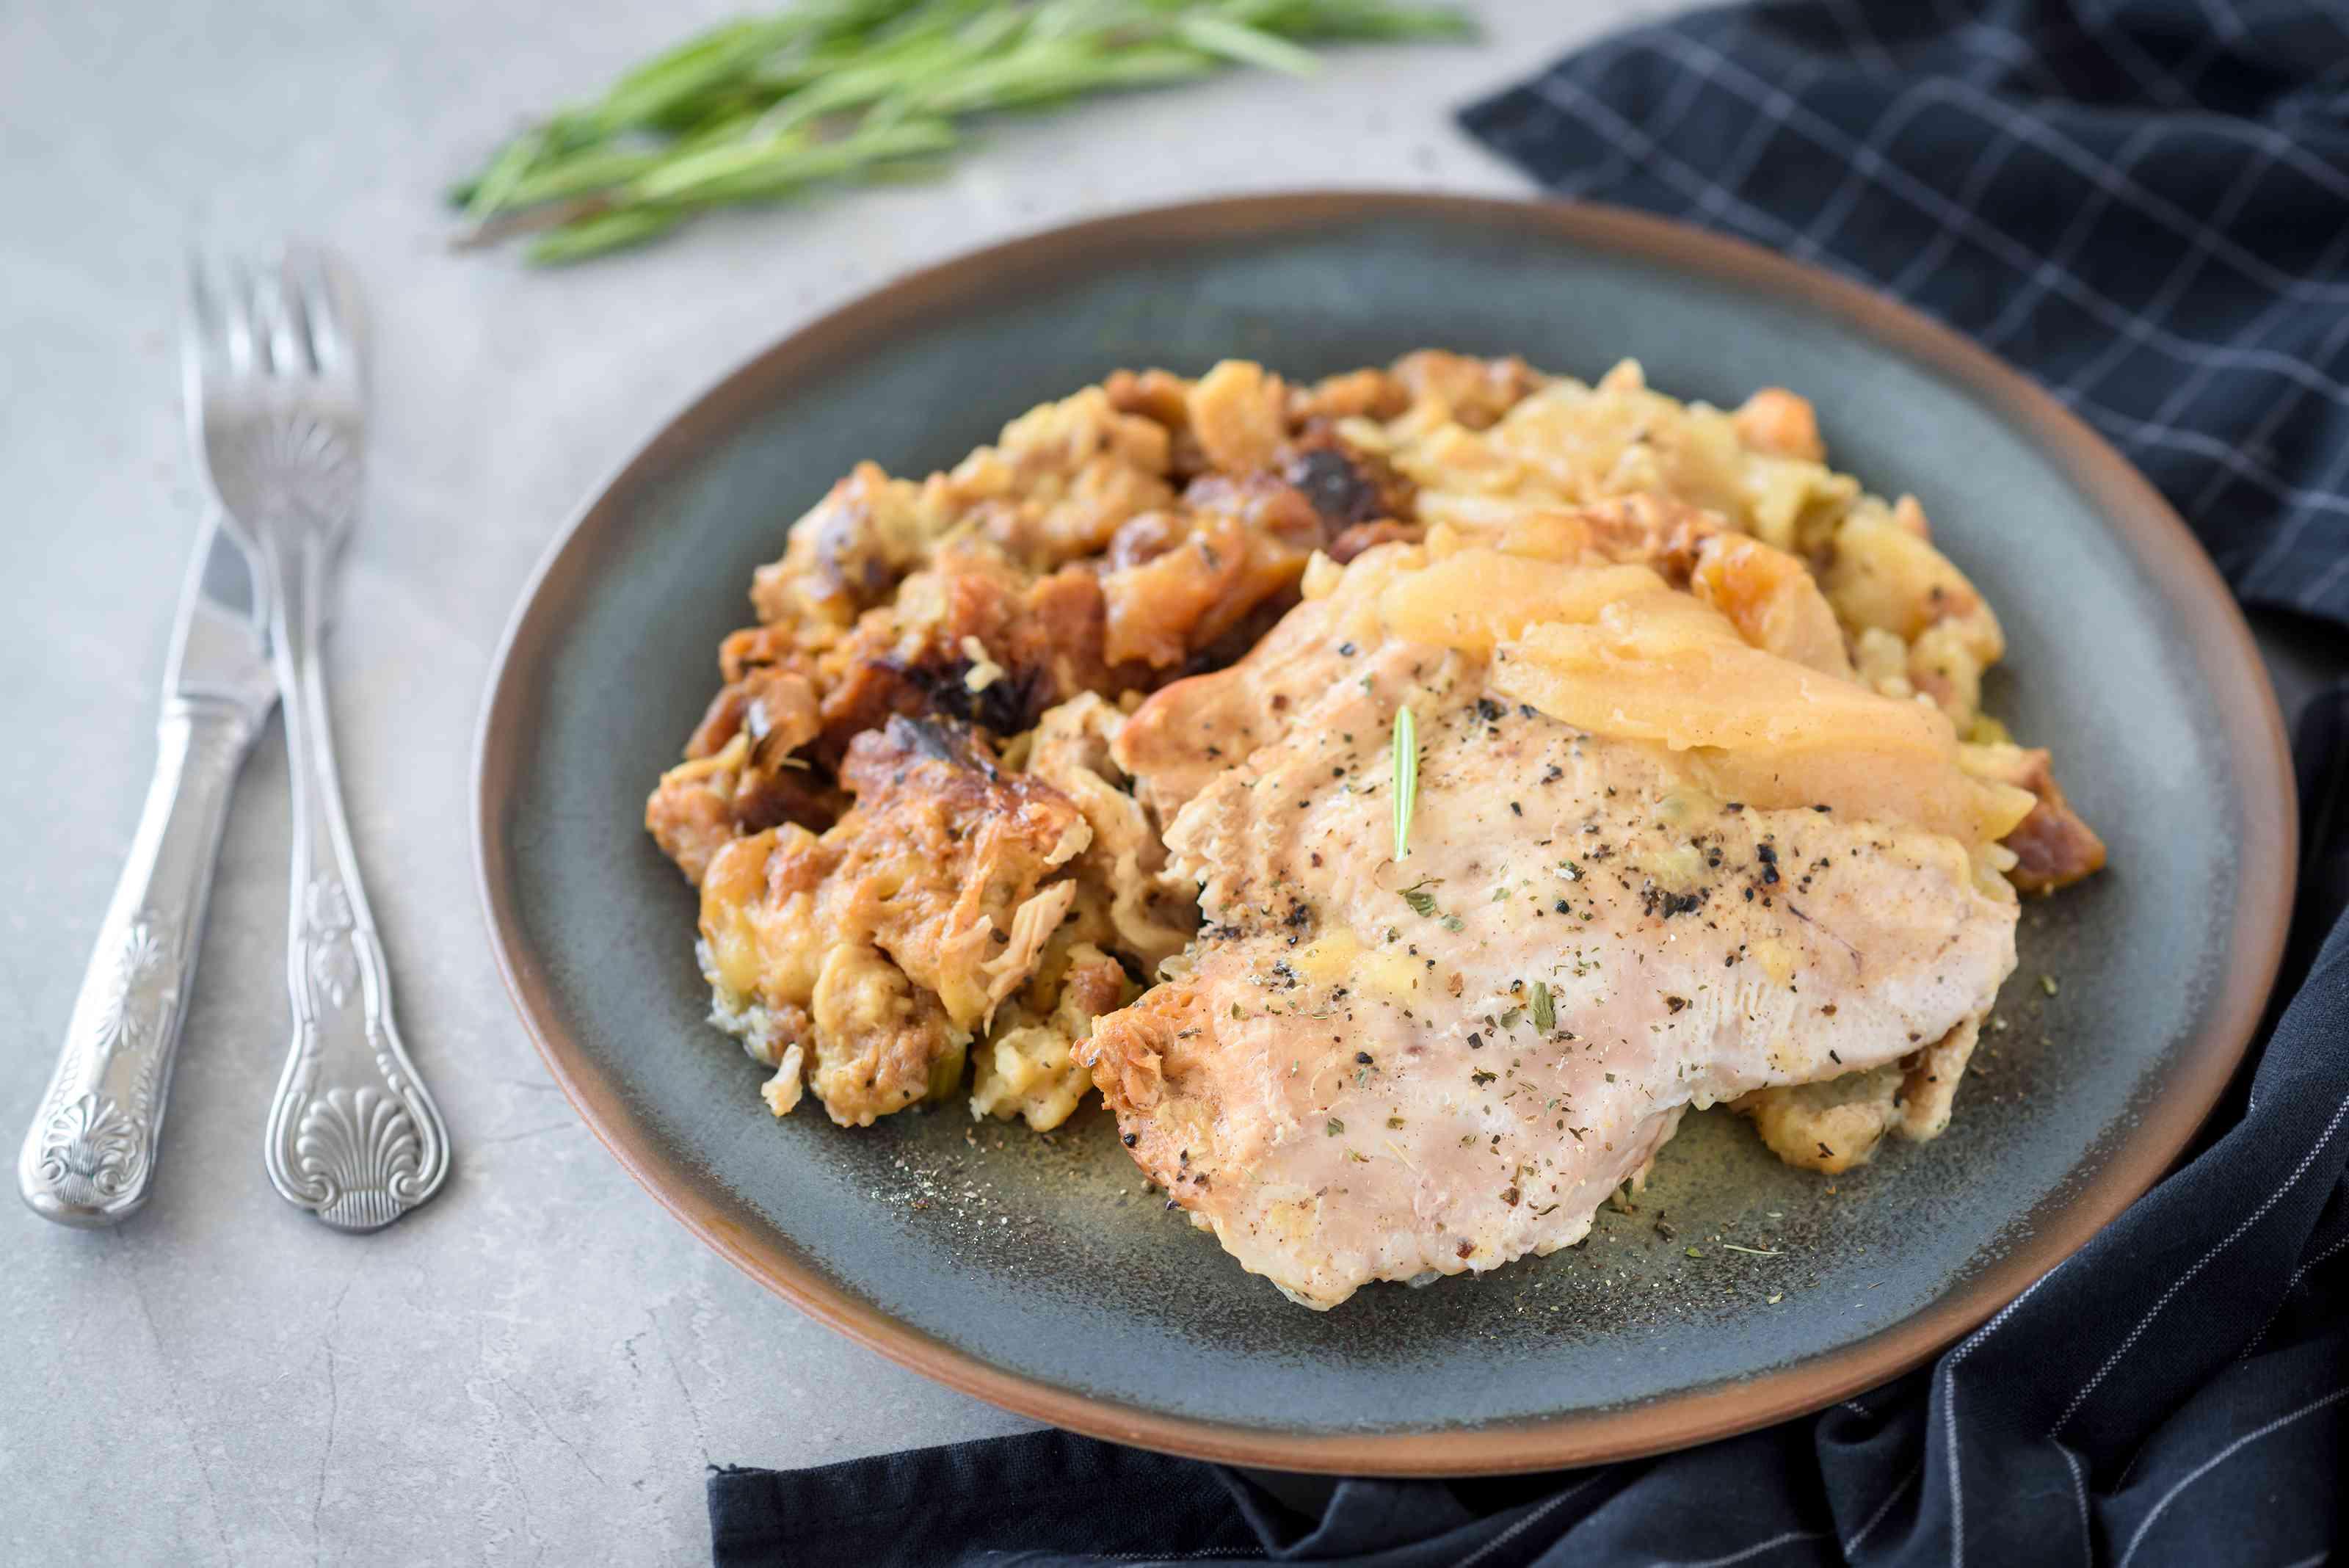 Crockpot turkey cutlet recipe with stuffing